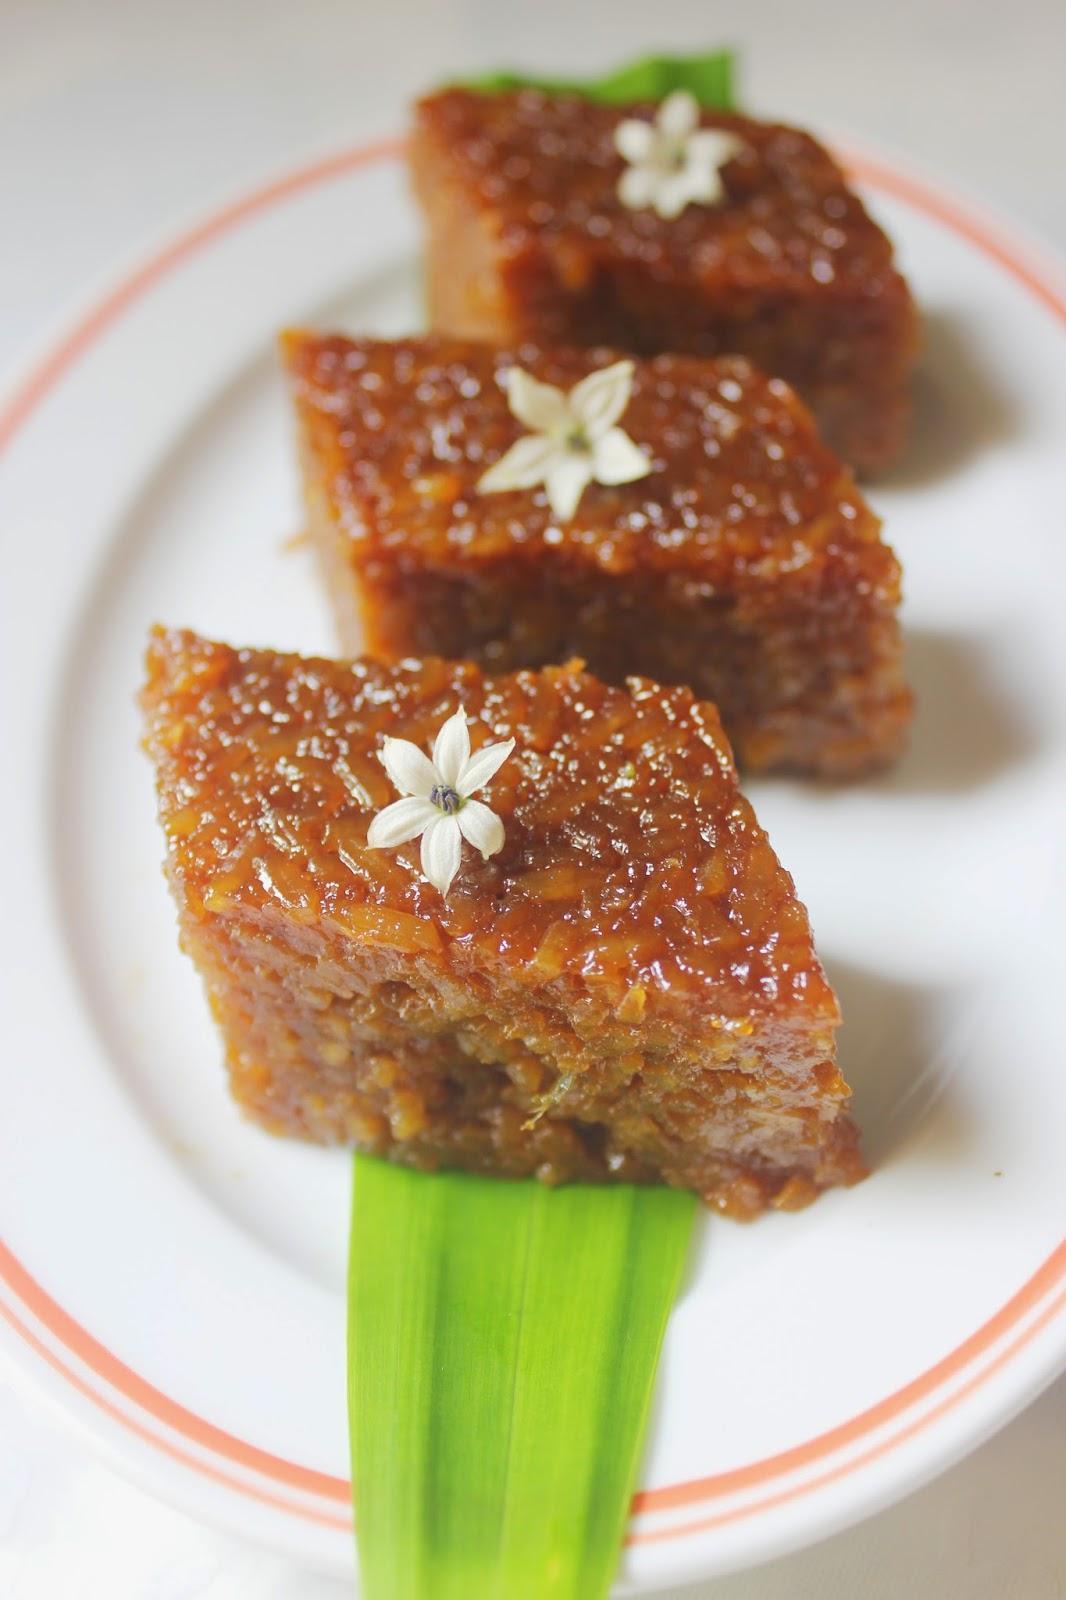 sweet glutinous rice on plate